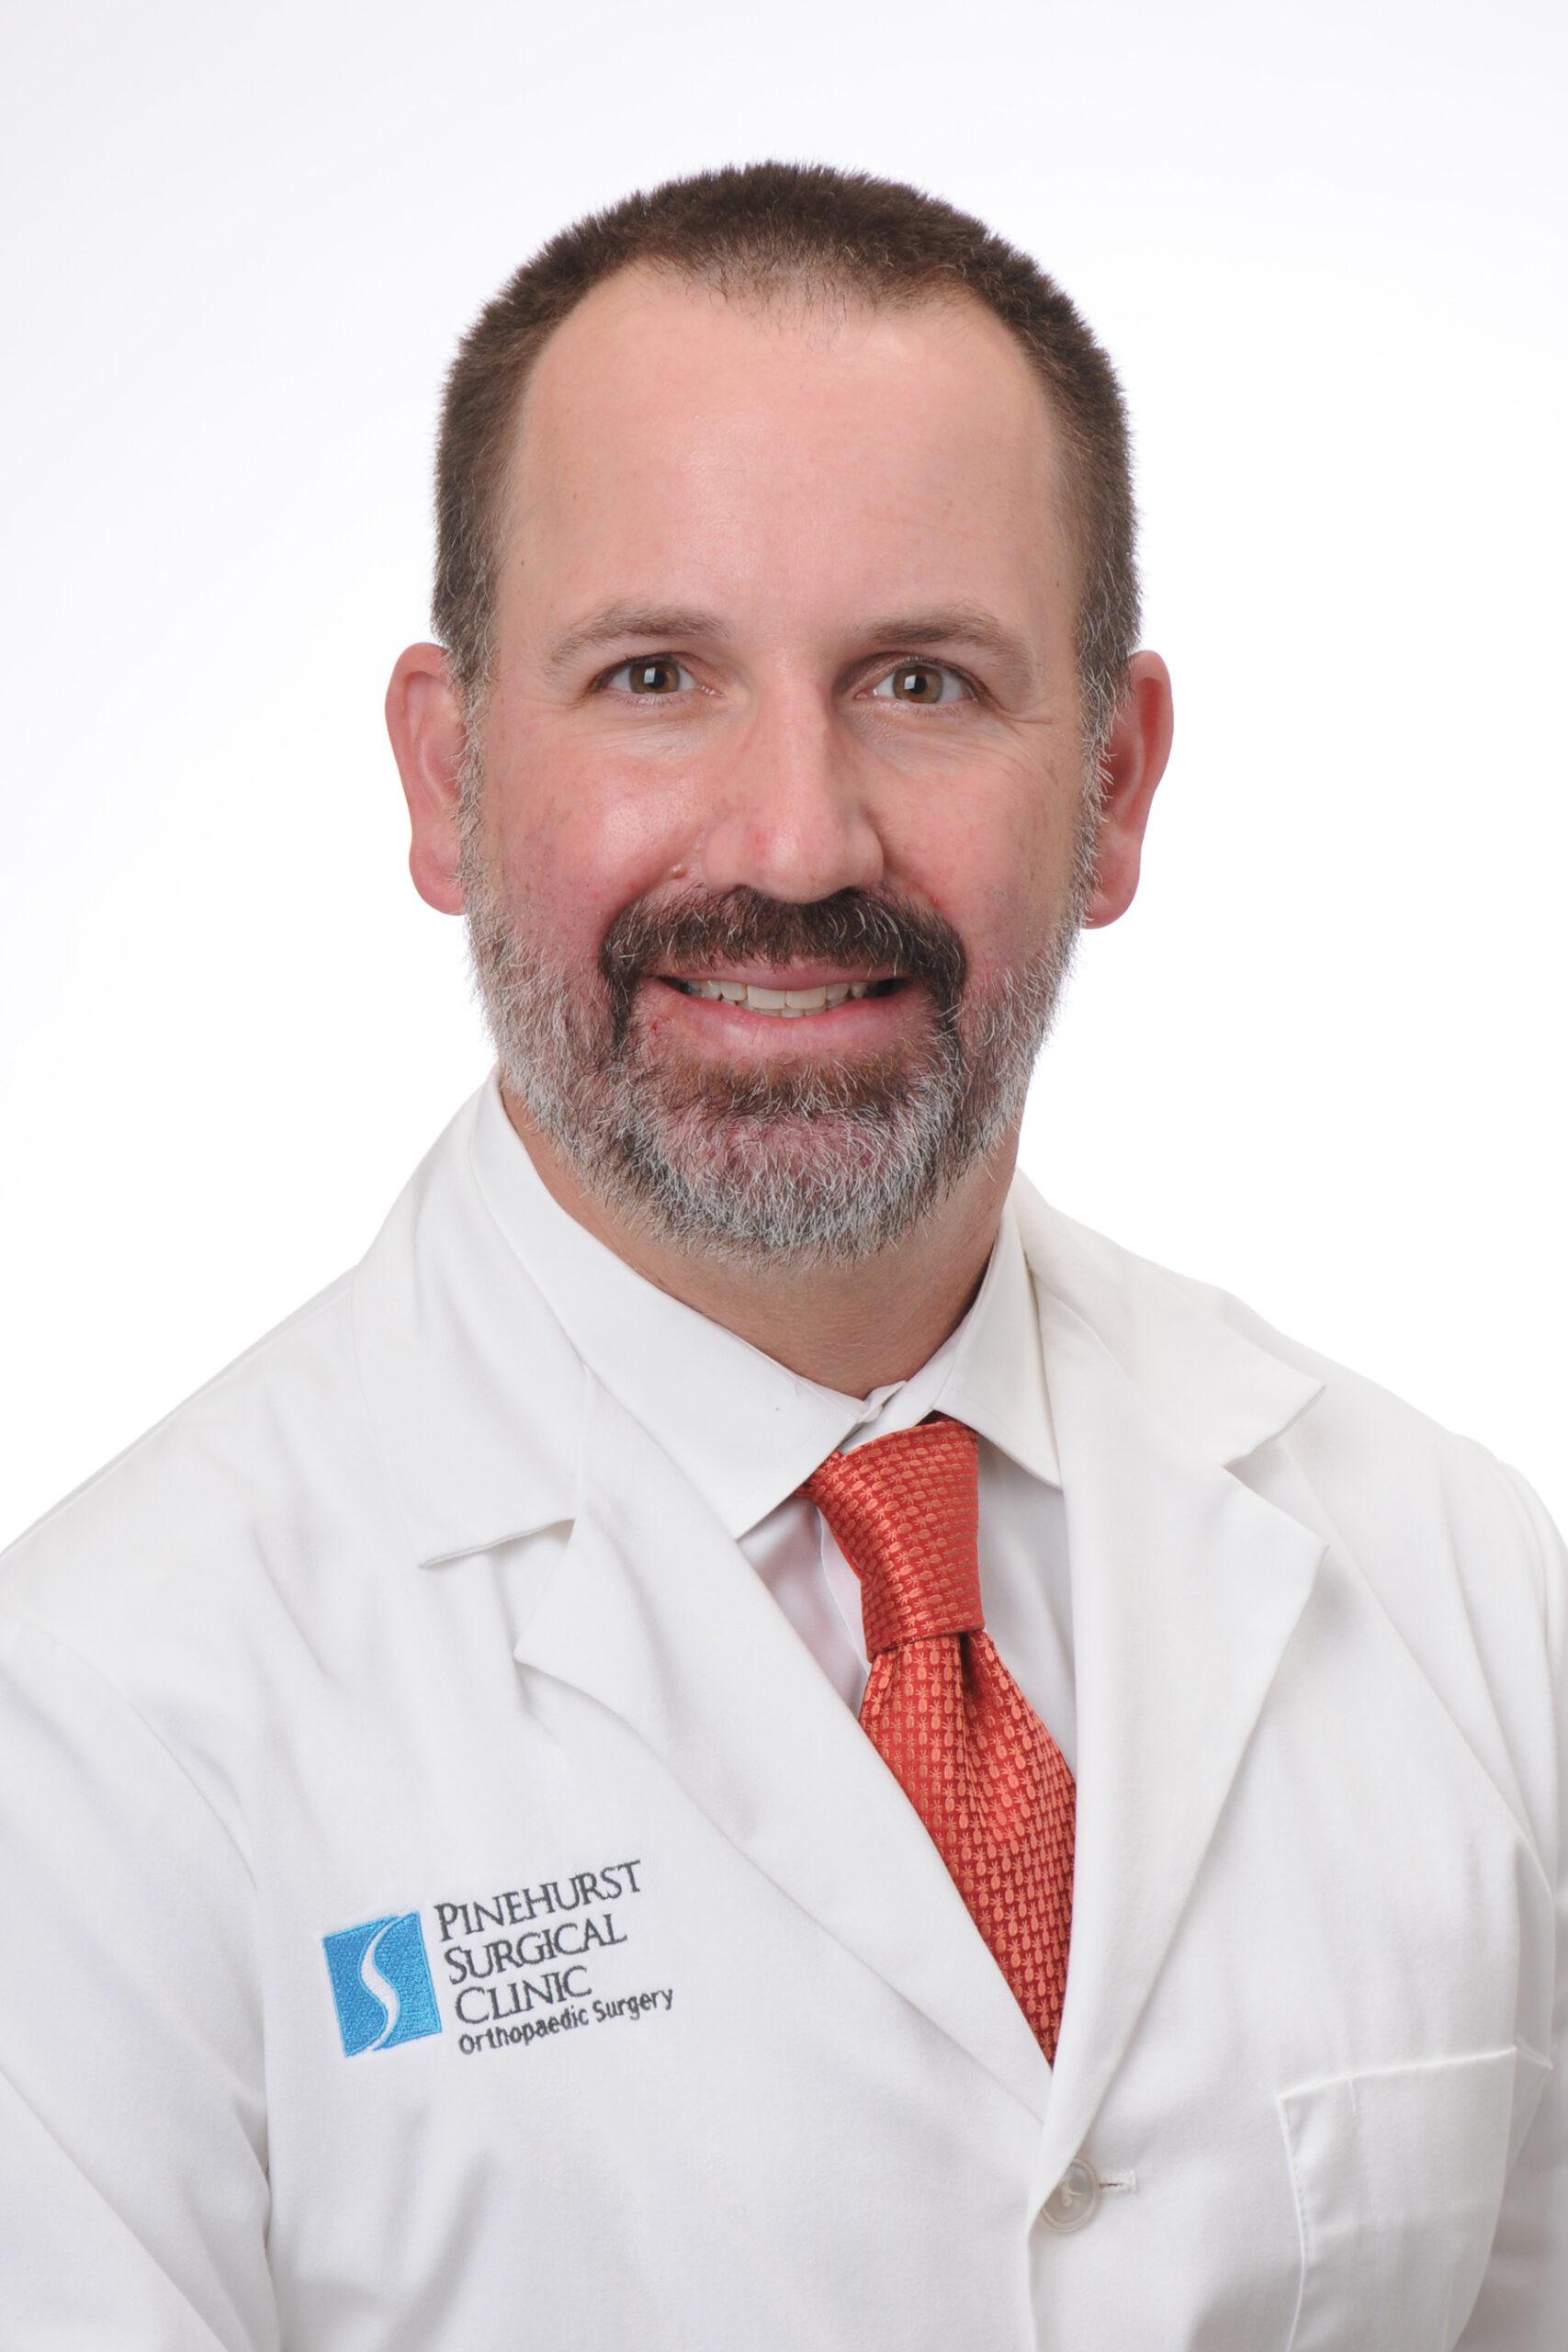 Dr. Robert Keller Orthopaedic Surgery - Updated 2020